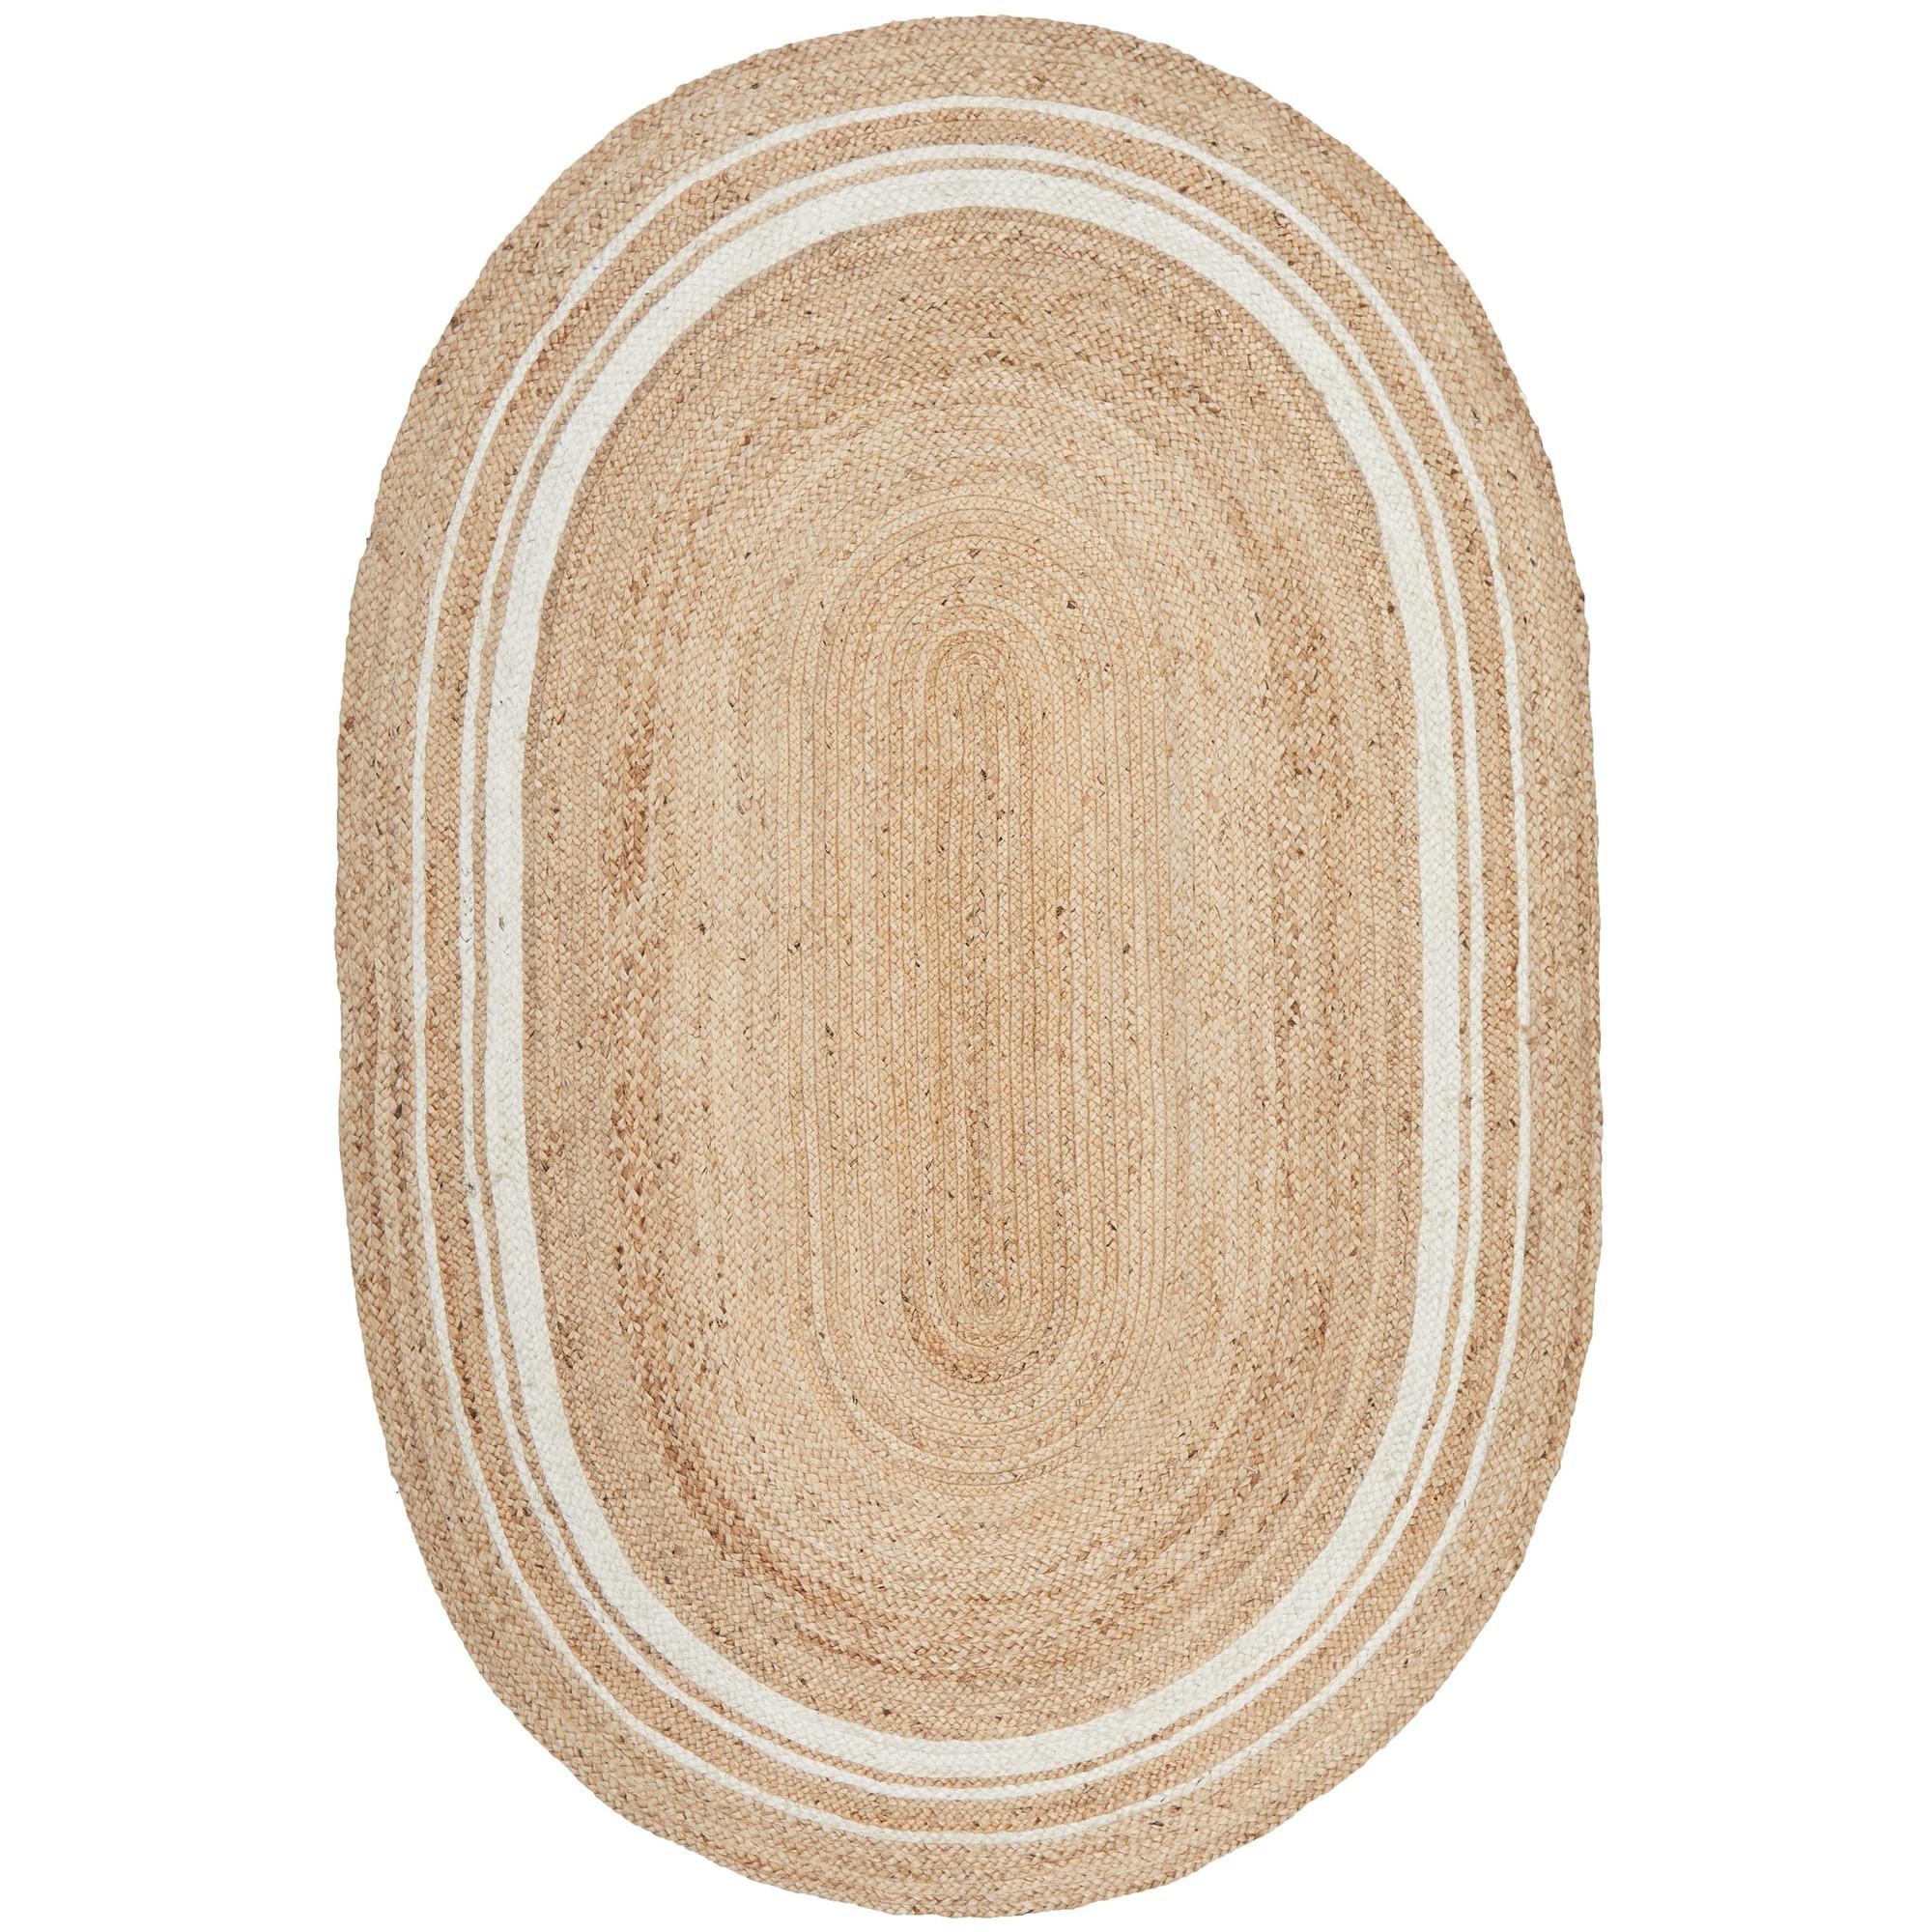 Noosa No.111 Jute Oval Rug, 280x190cm